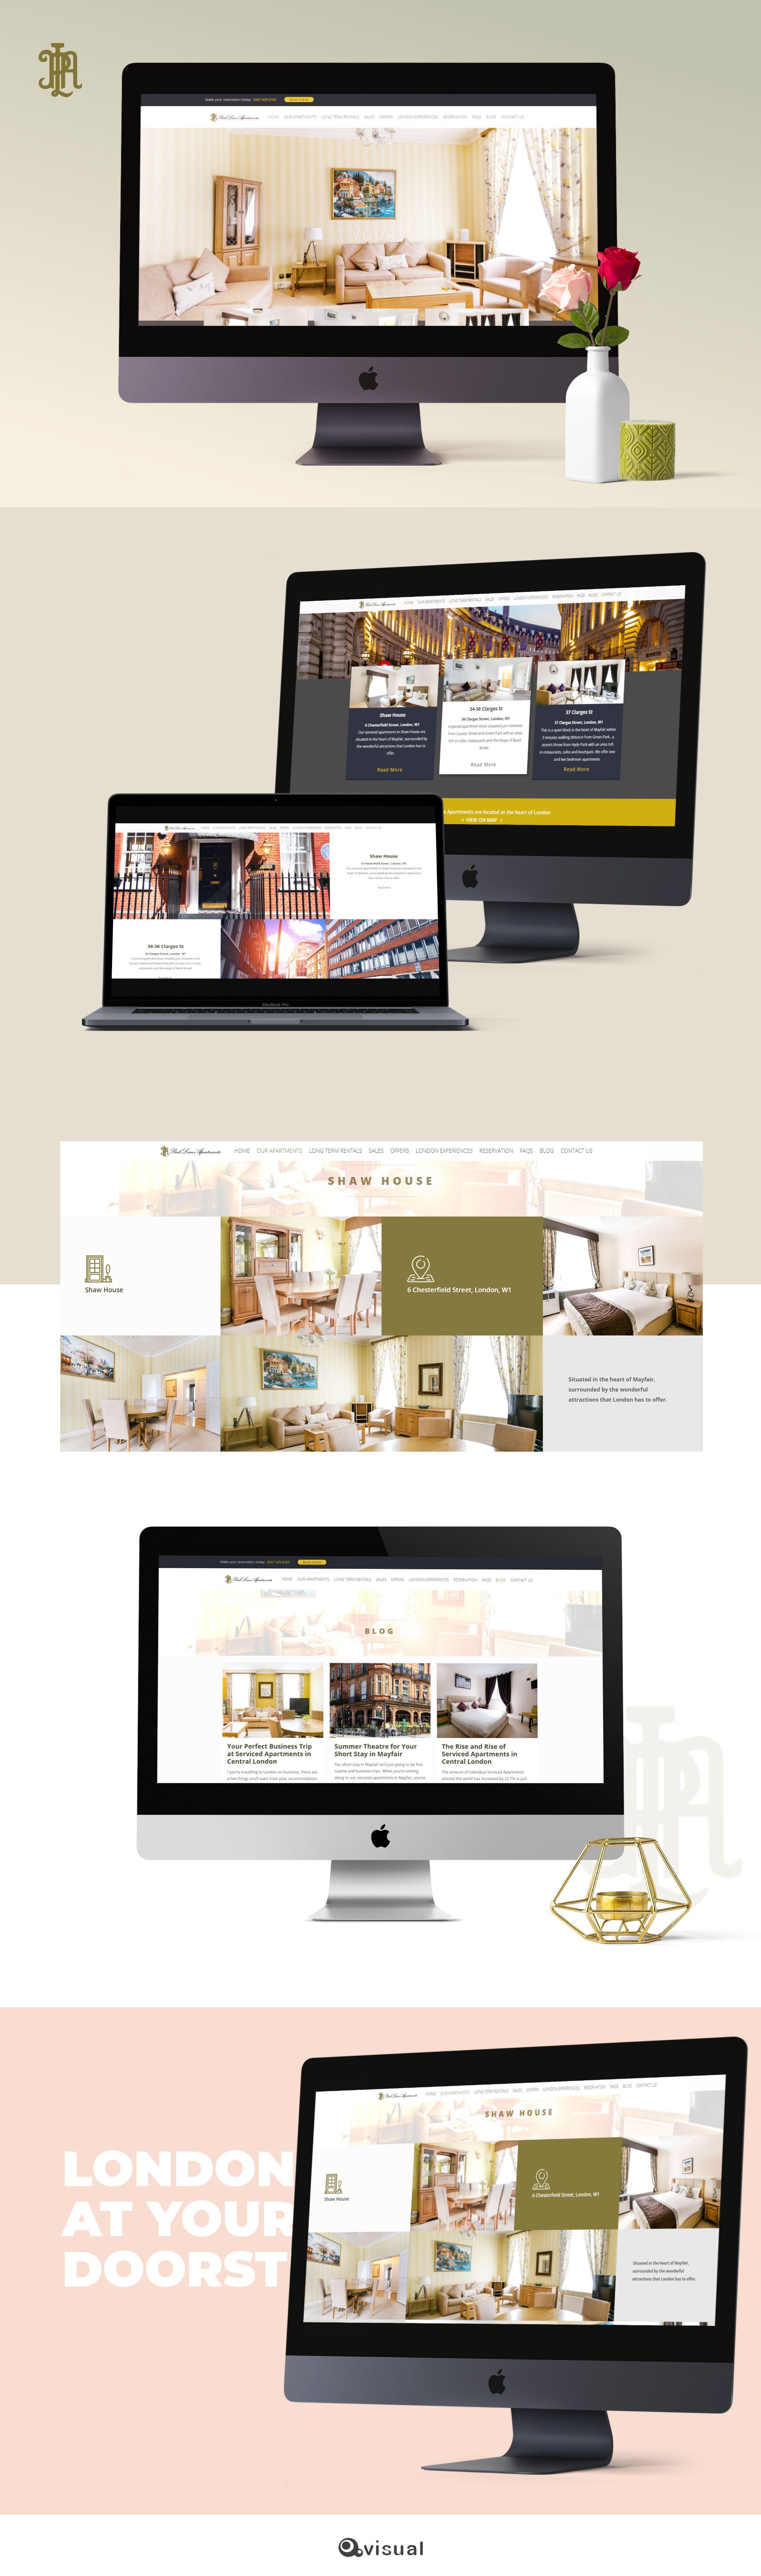 Sale Web Banner For Social Media Collection 3 Spanduk Desain Grafis Desain